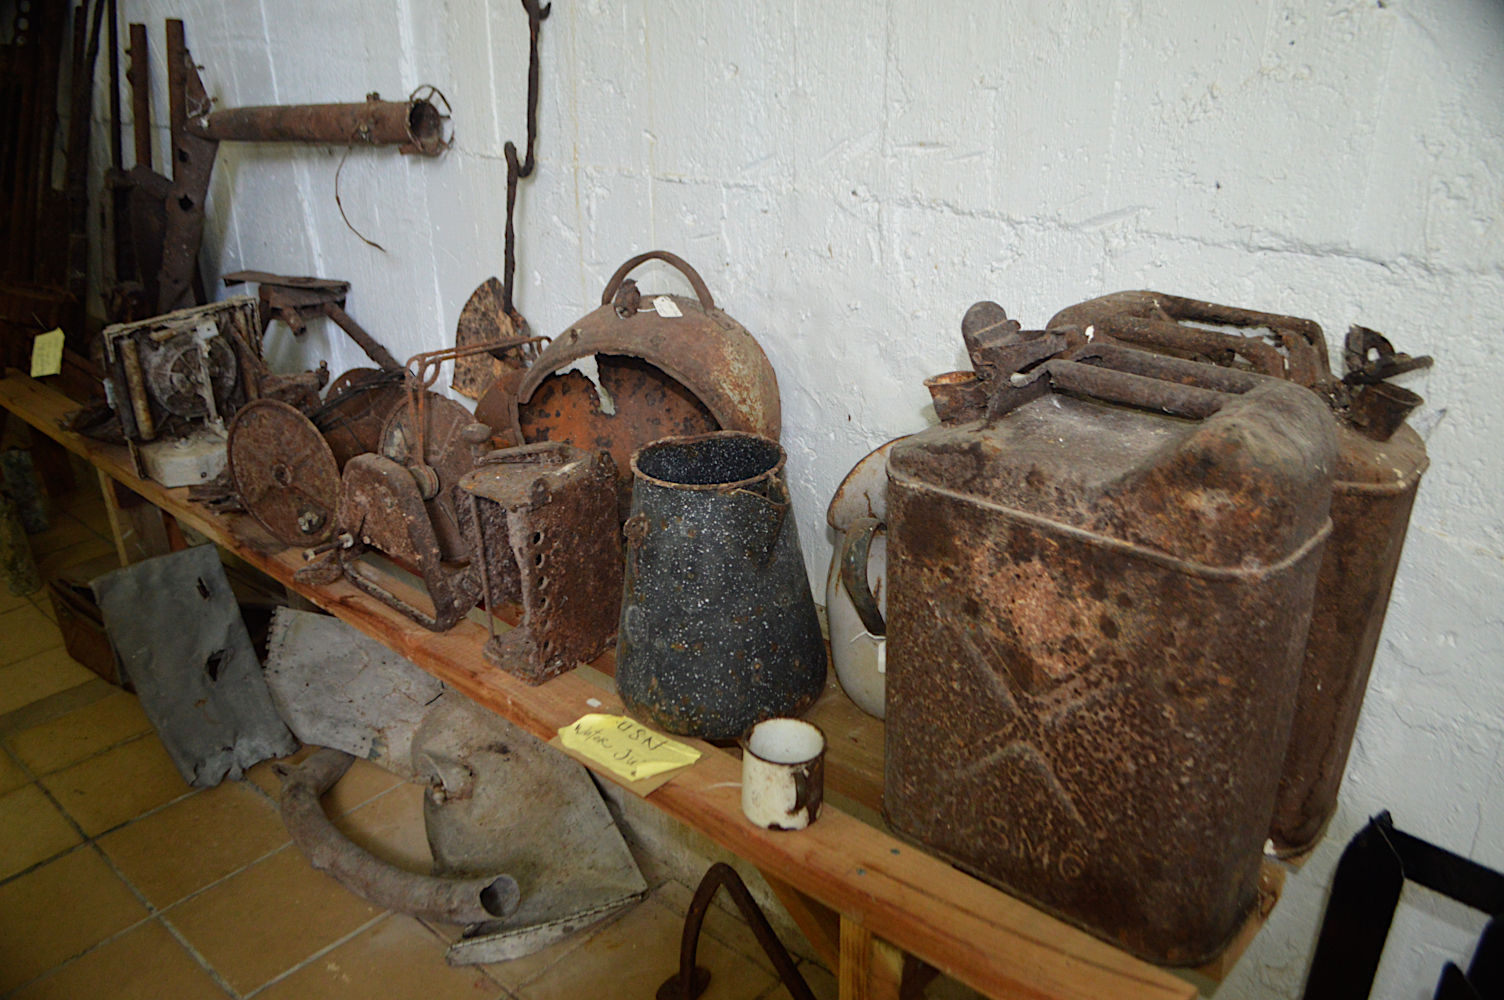 Museo de la Segunda Guerra Mundial de Peleliu